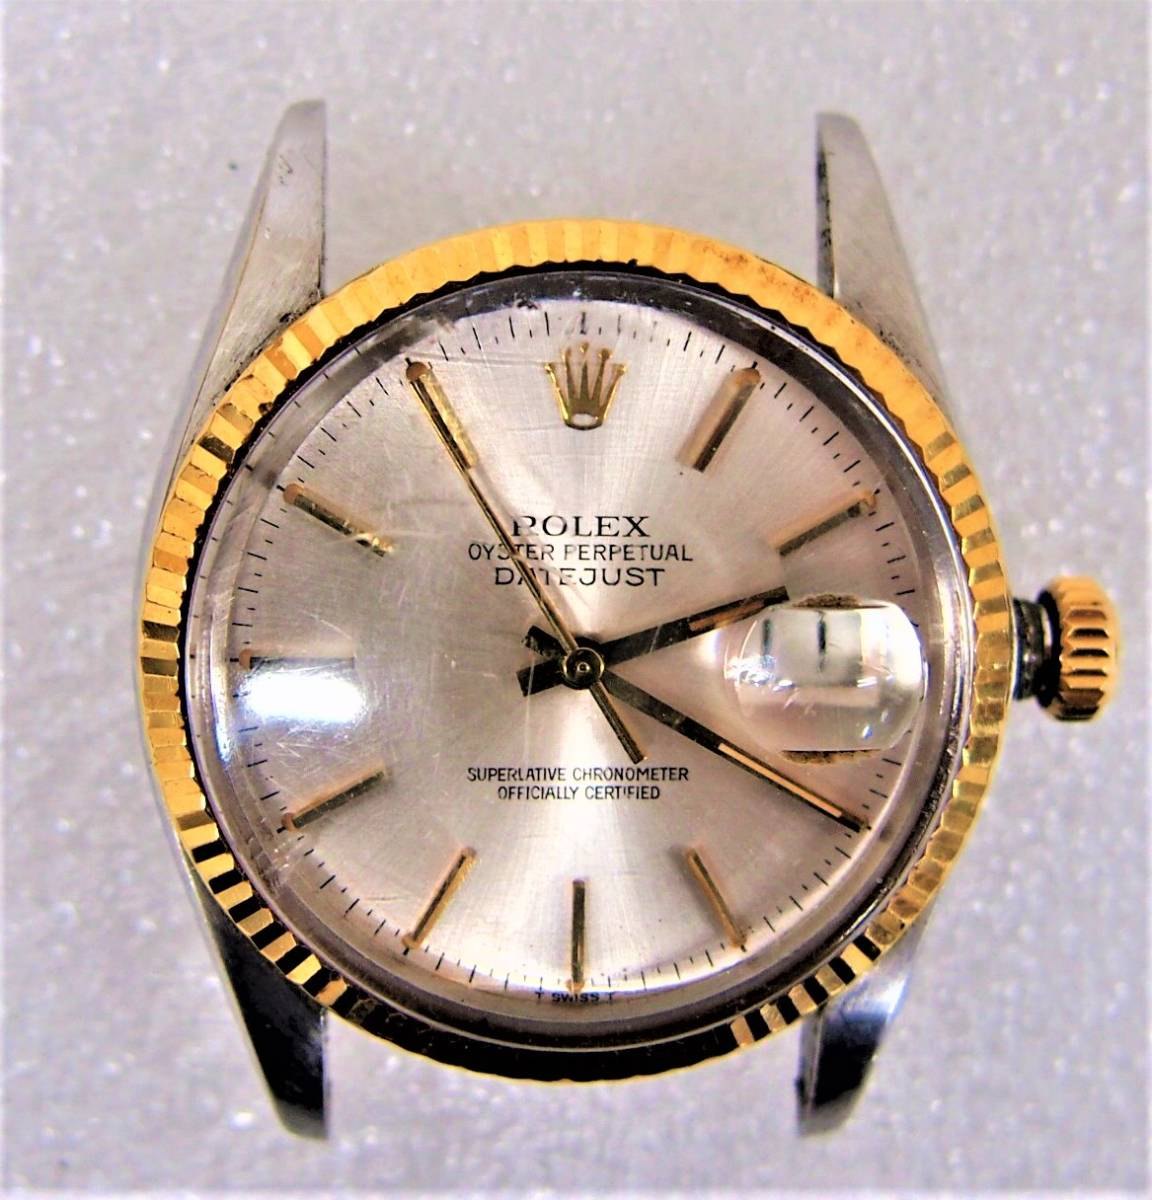 E★ロレックス デイトジャスト ROLEX DATE JUST 16013 8番台 コンビ YG/SS メンズ 腕時計 ジャンク品 1円スタート_画像2